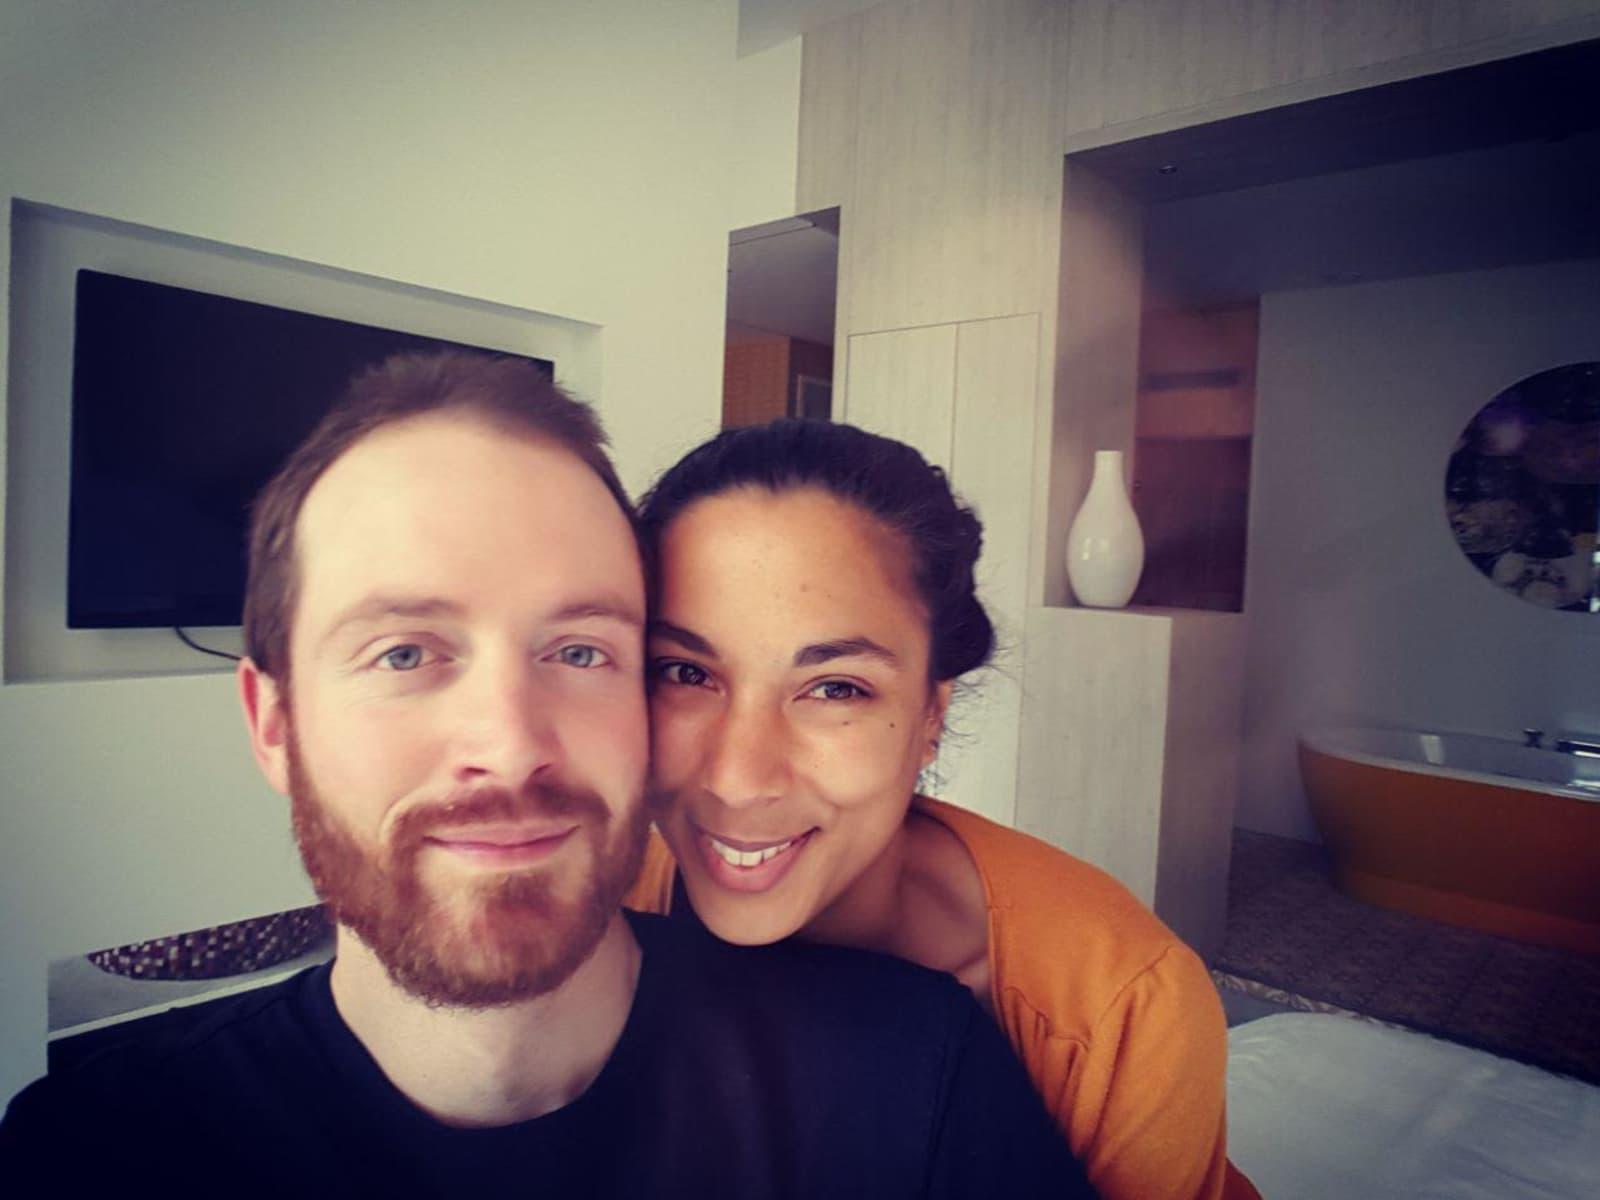 Sandro & Tamara from Zürich, Switzerland